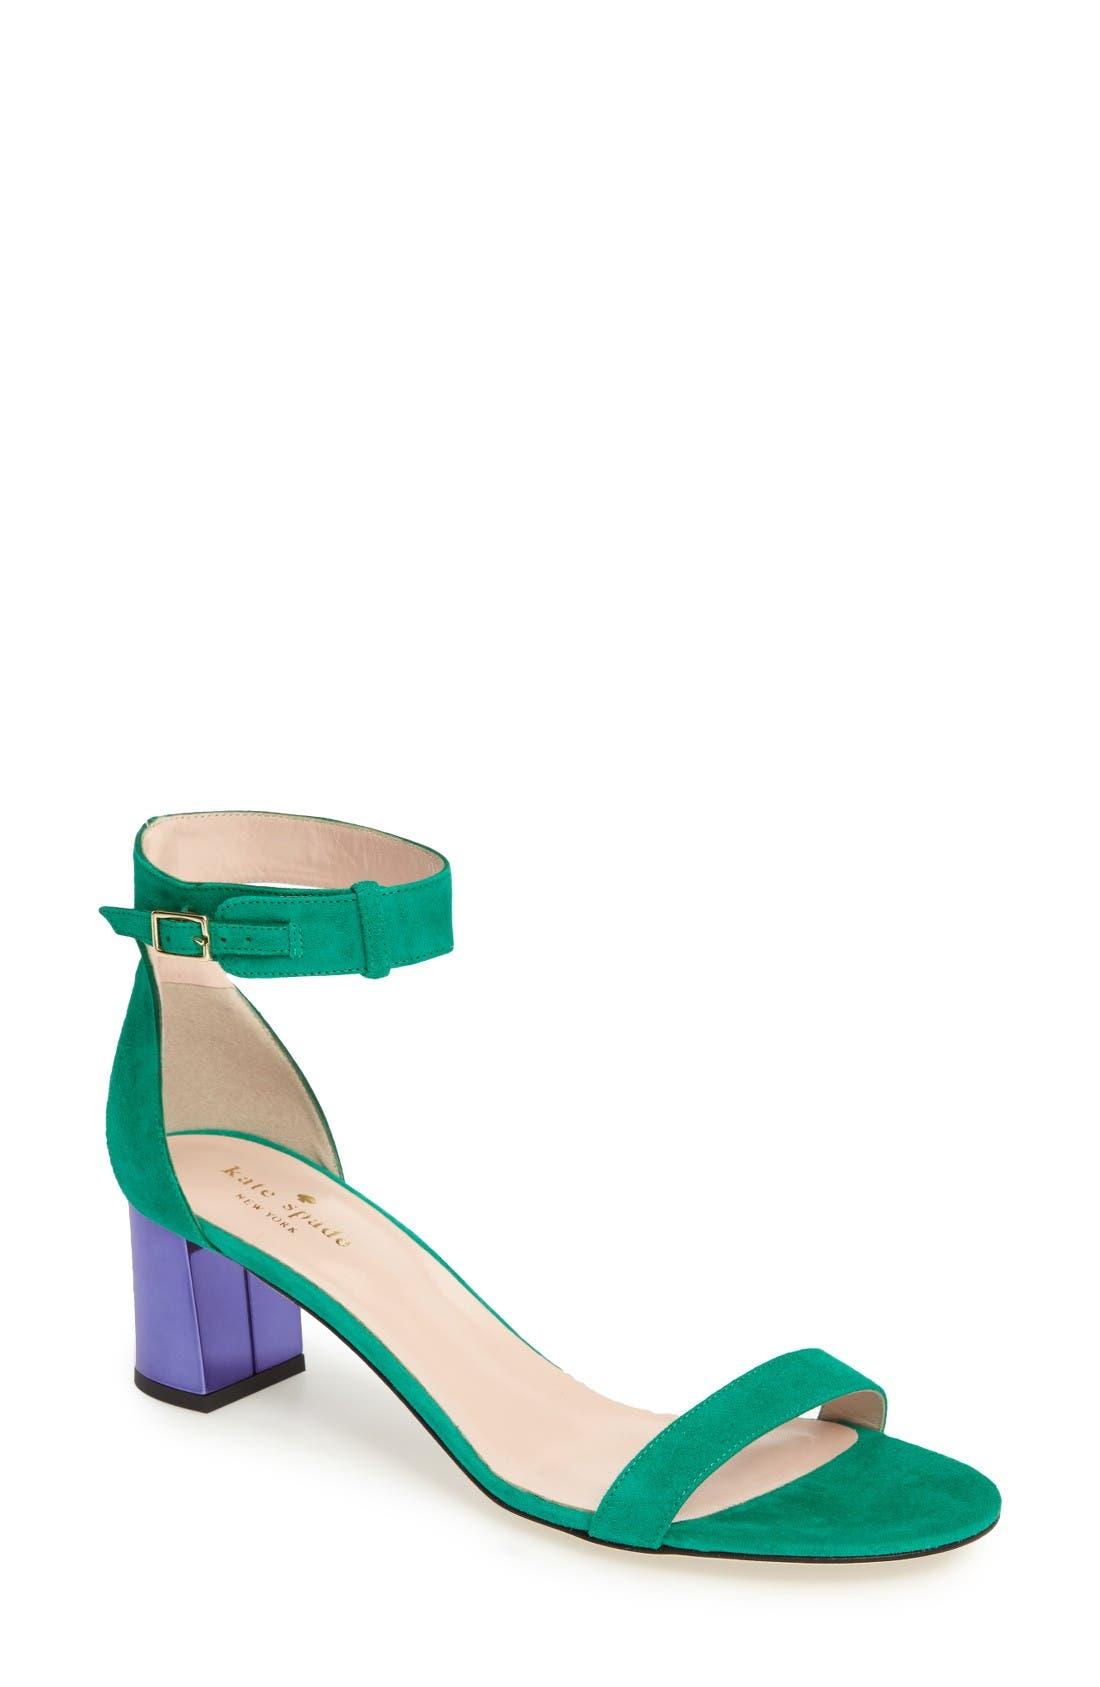 Main Image - kate spade new york menorca ankle strap sandal (Women)